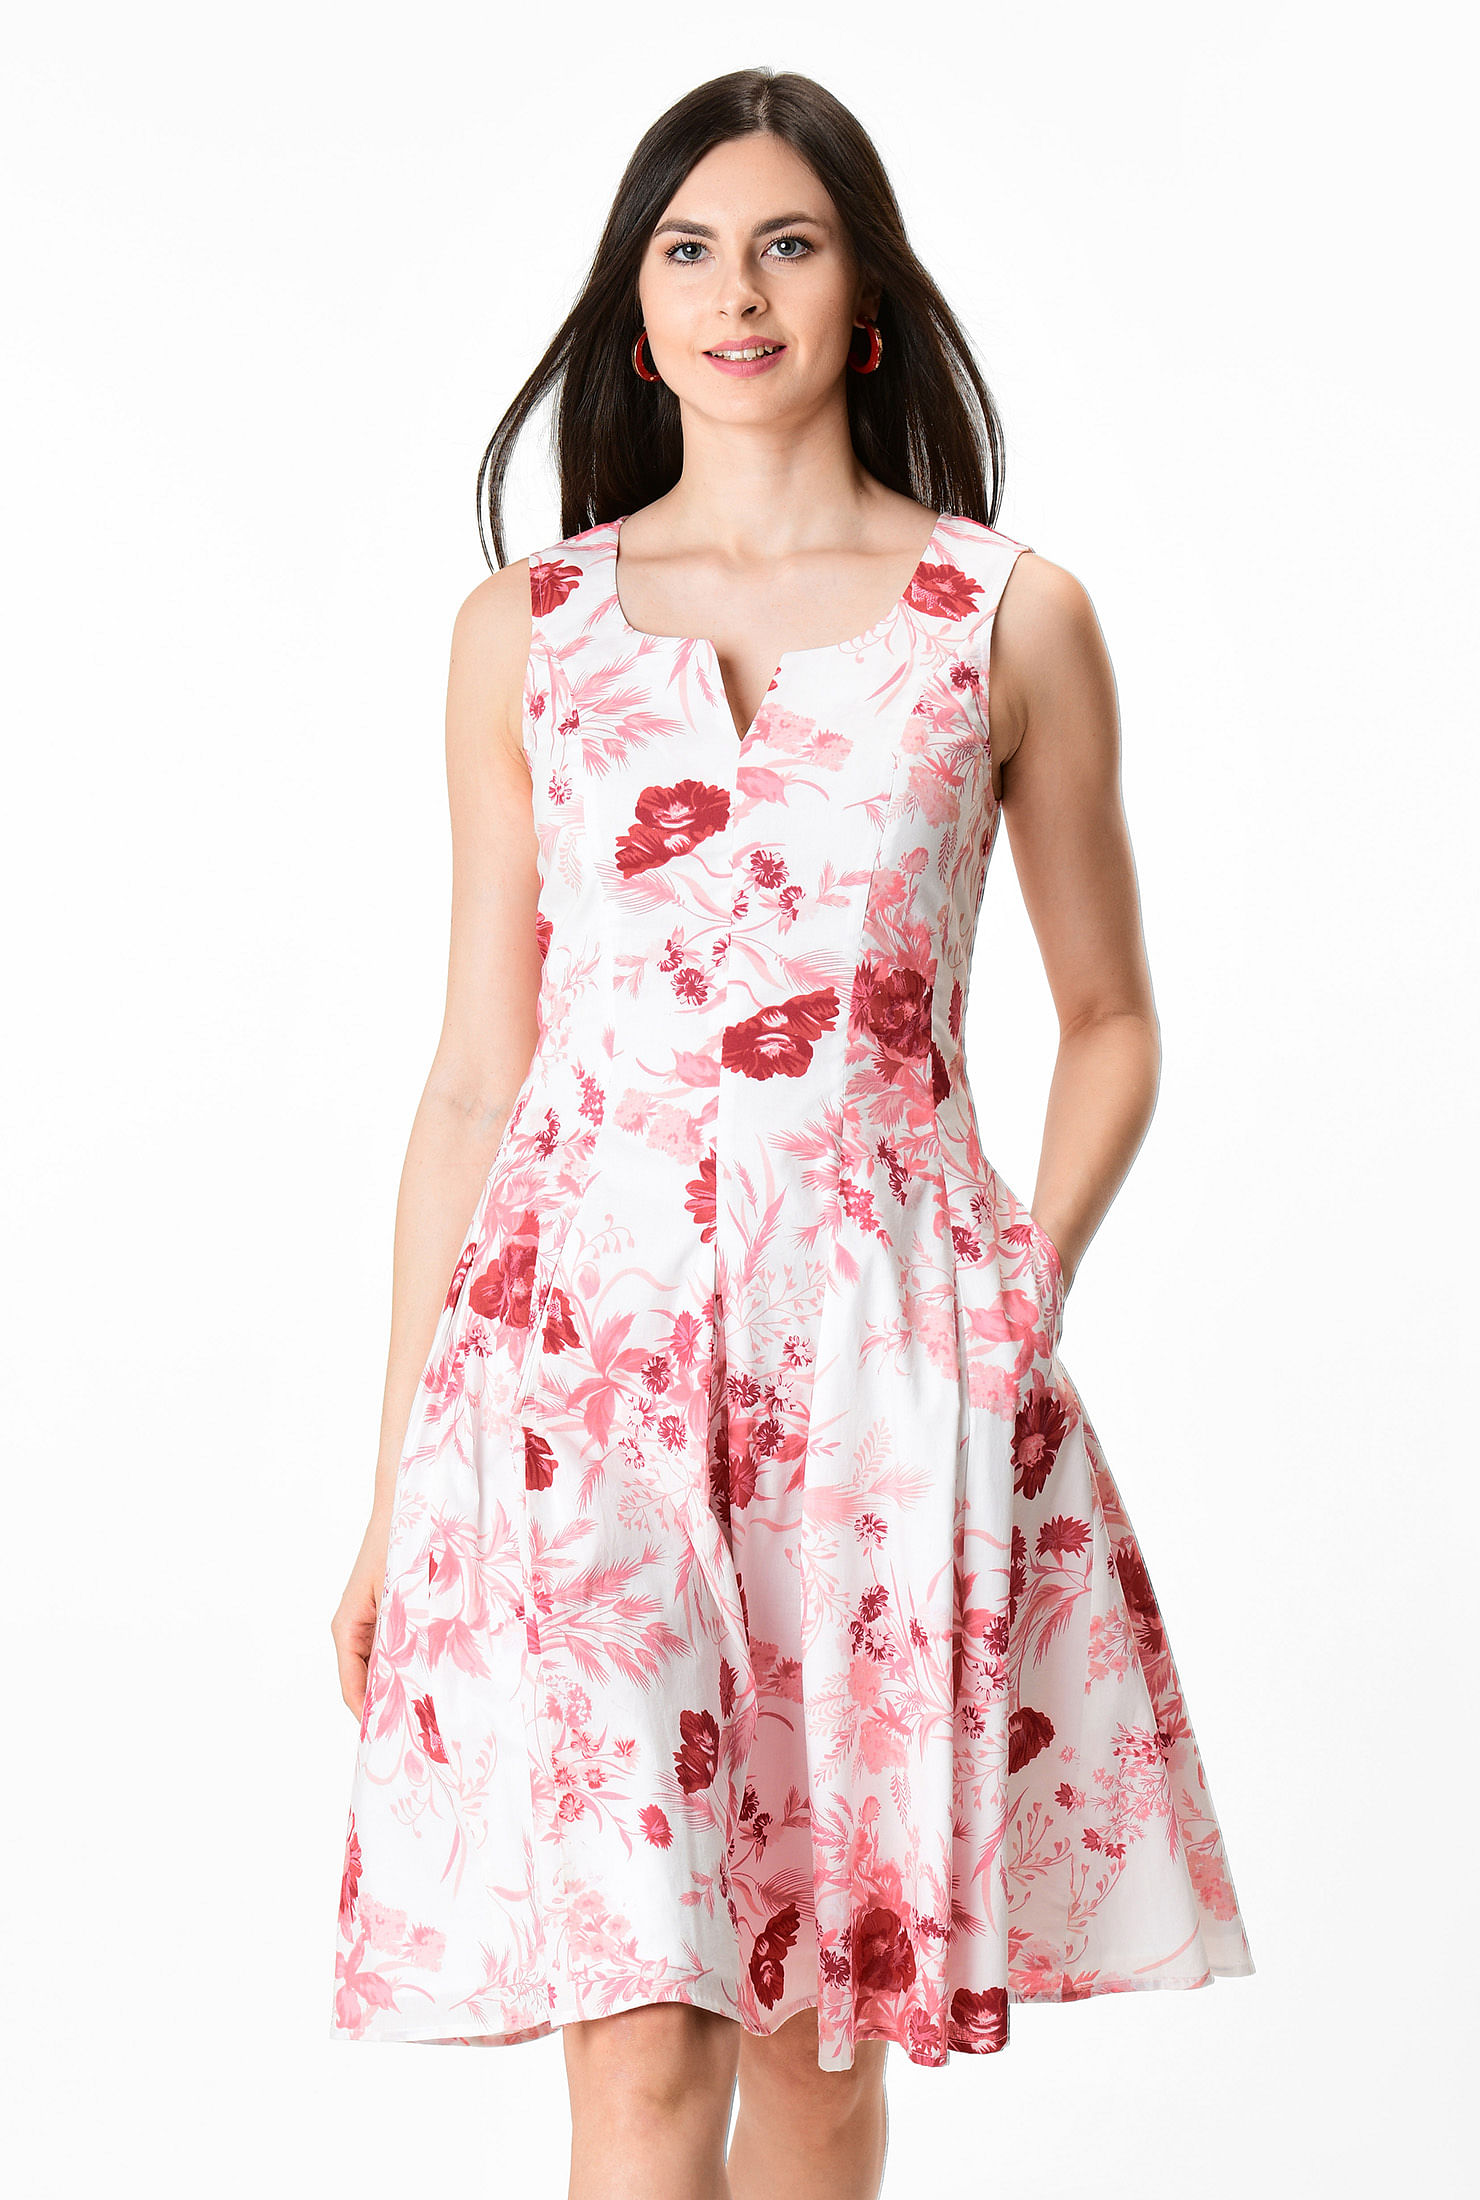 b94634b46c178 All size inclusive, casual event dresses, custom size, custom style, petites